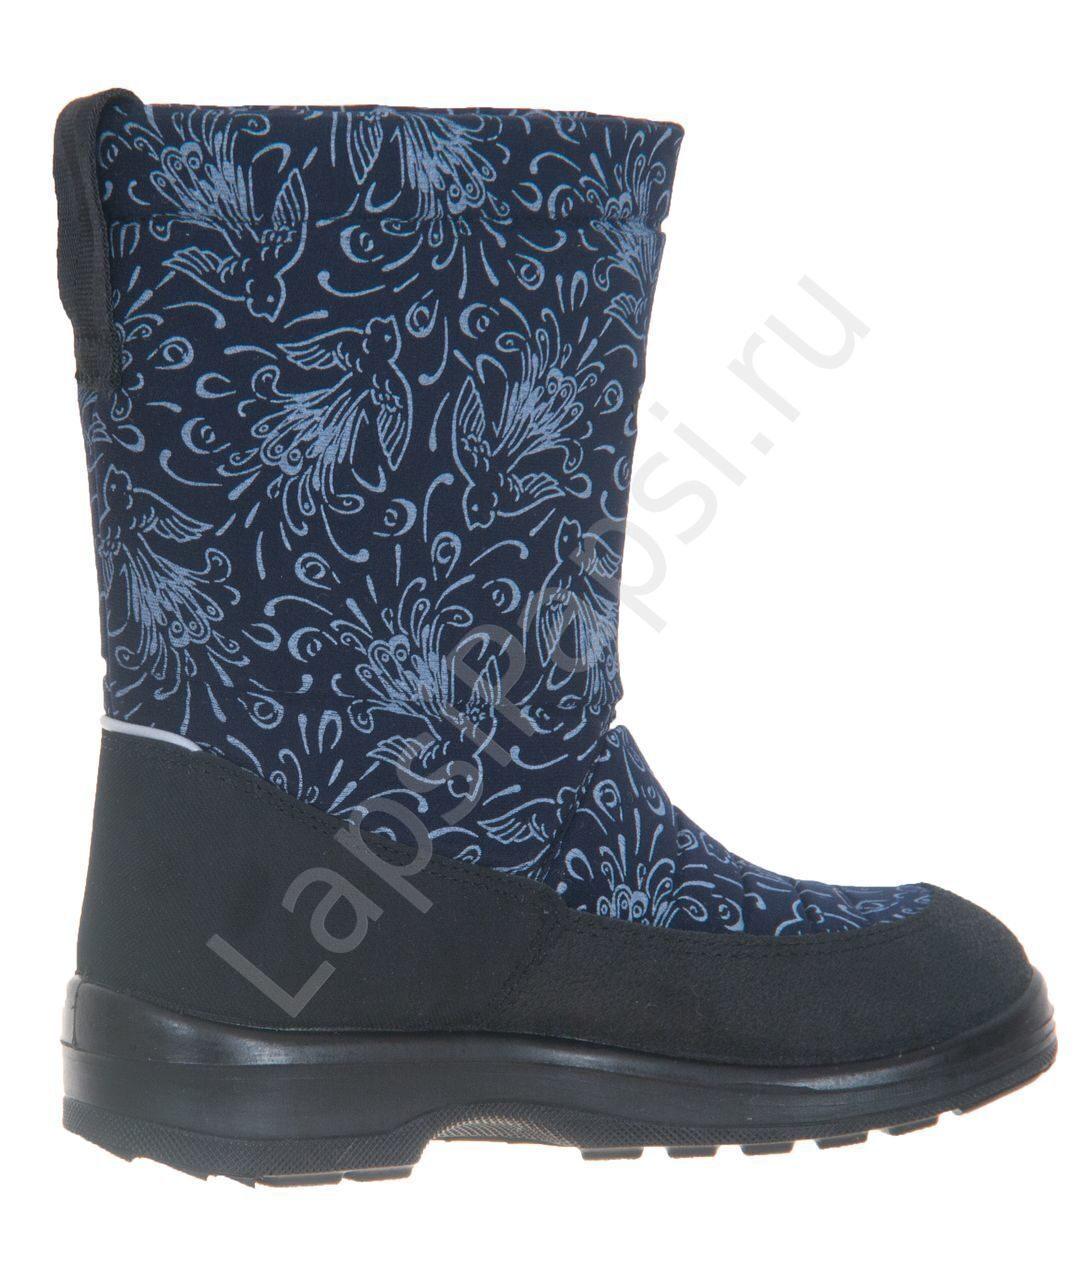 Kuoma сапоги валенки ботинки зимние для детей